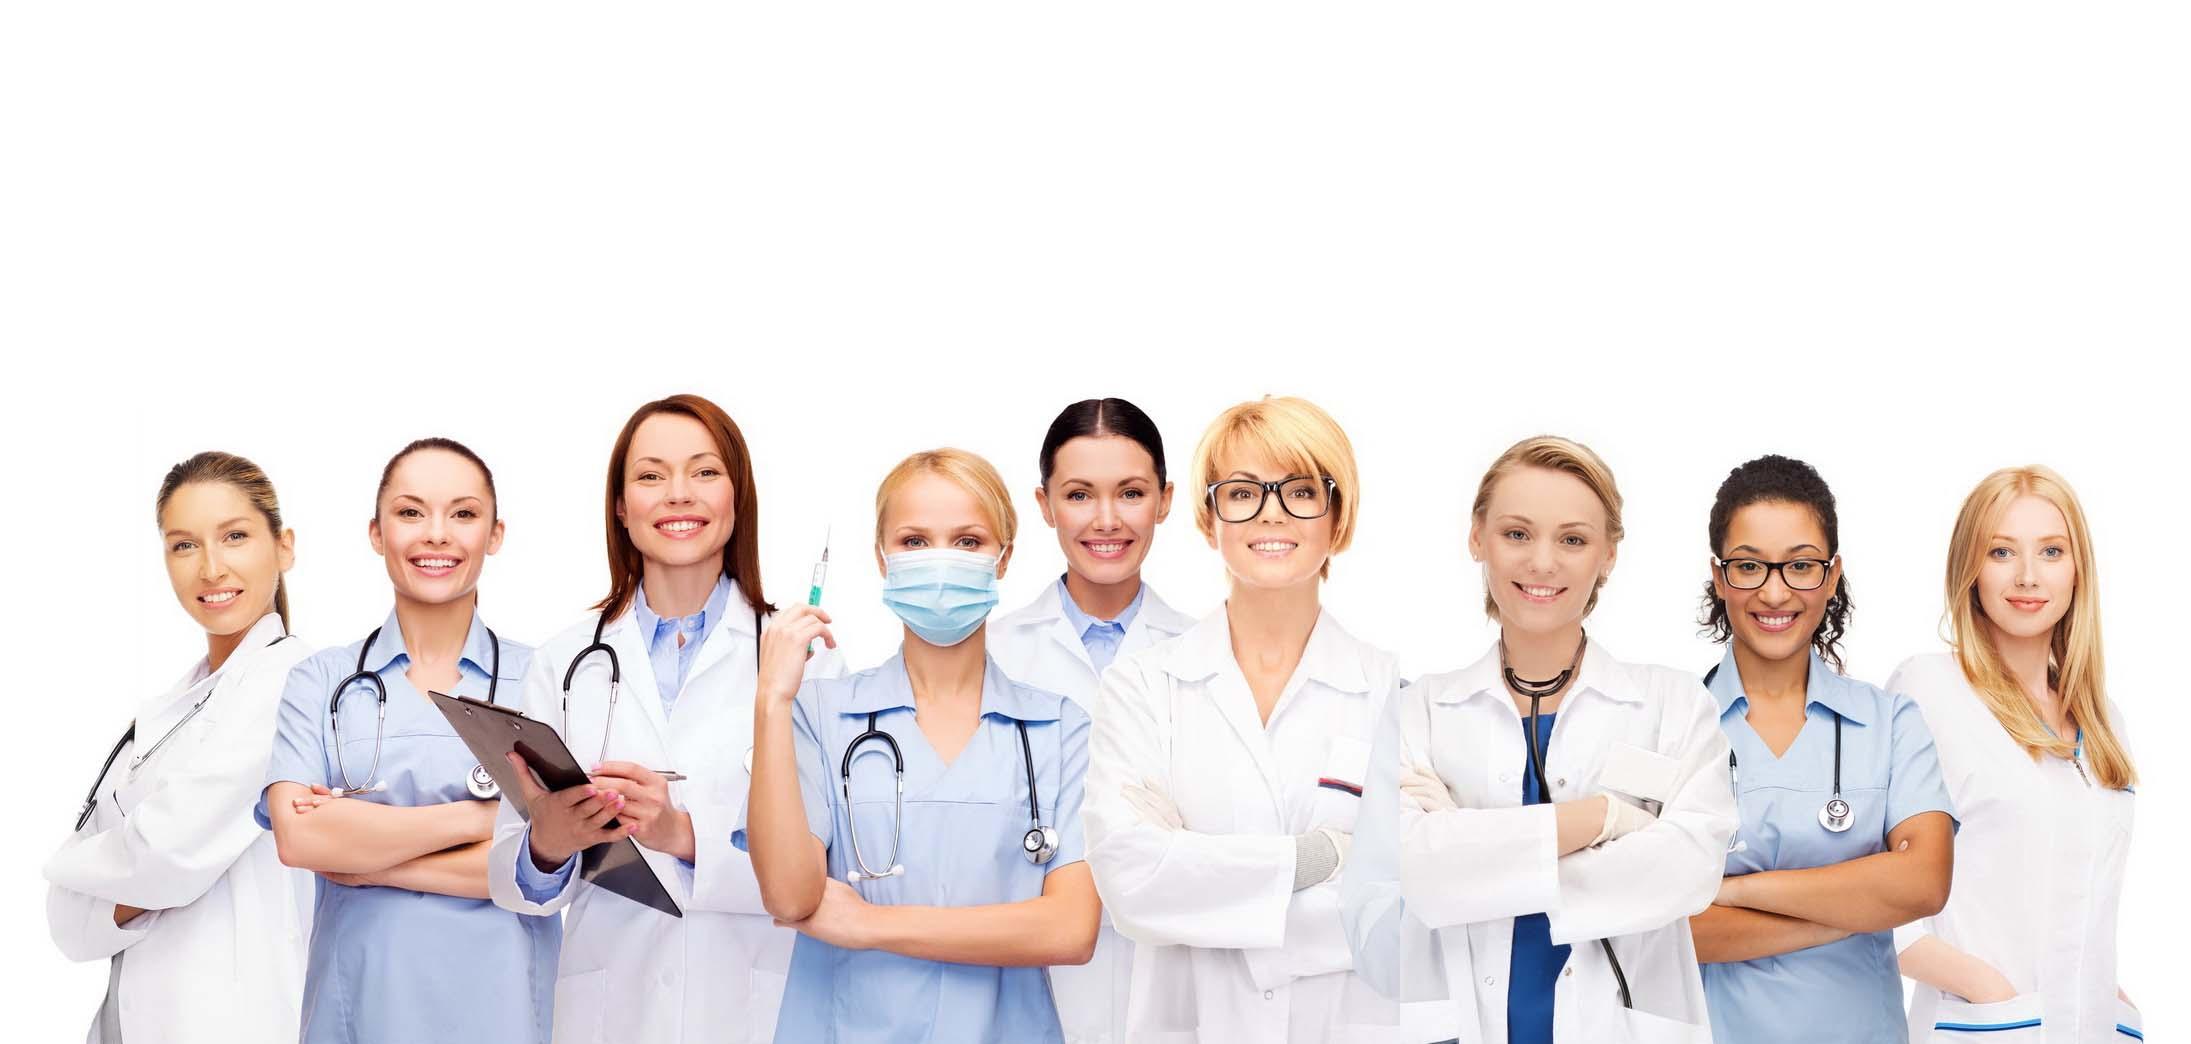 medizinstudium ausland